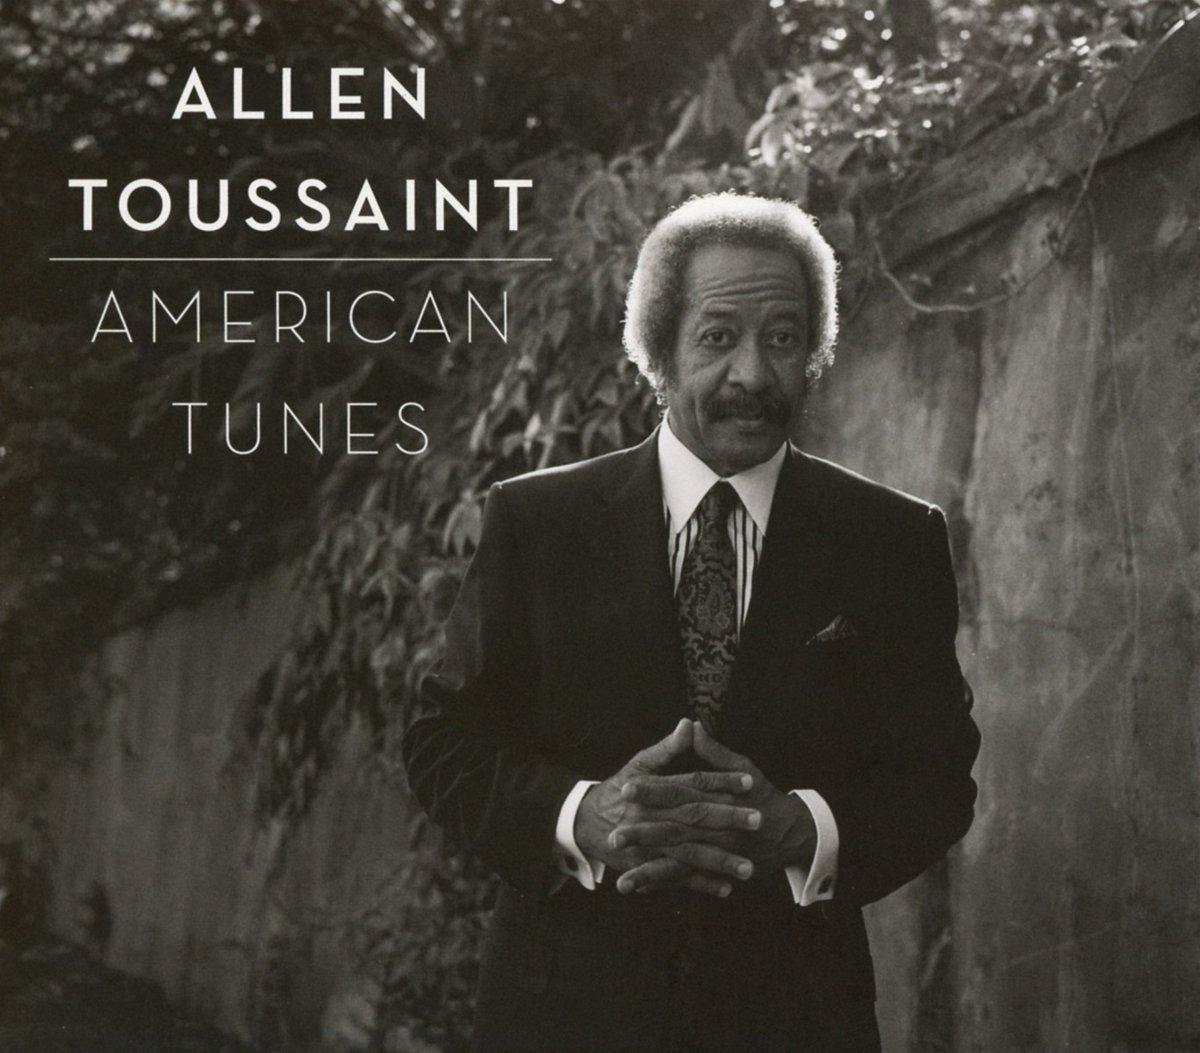 ALLEN TOUSSAINT – Americantune